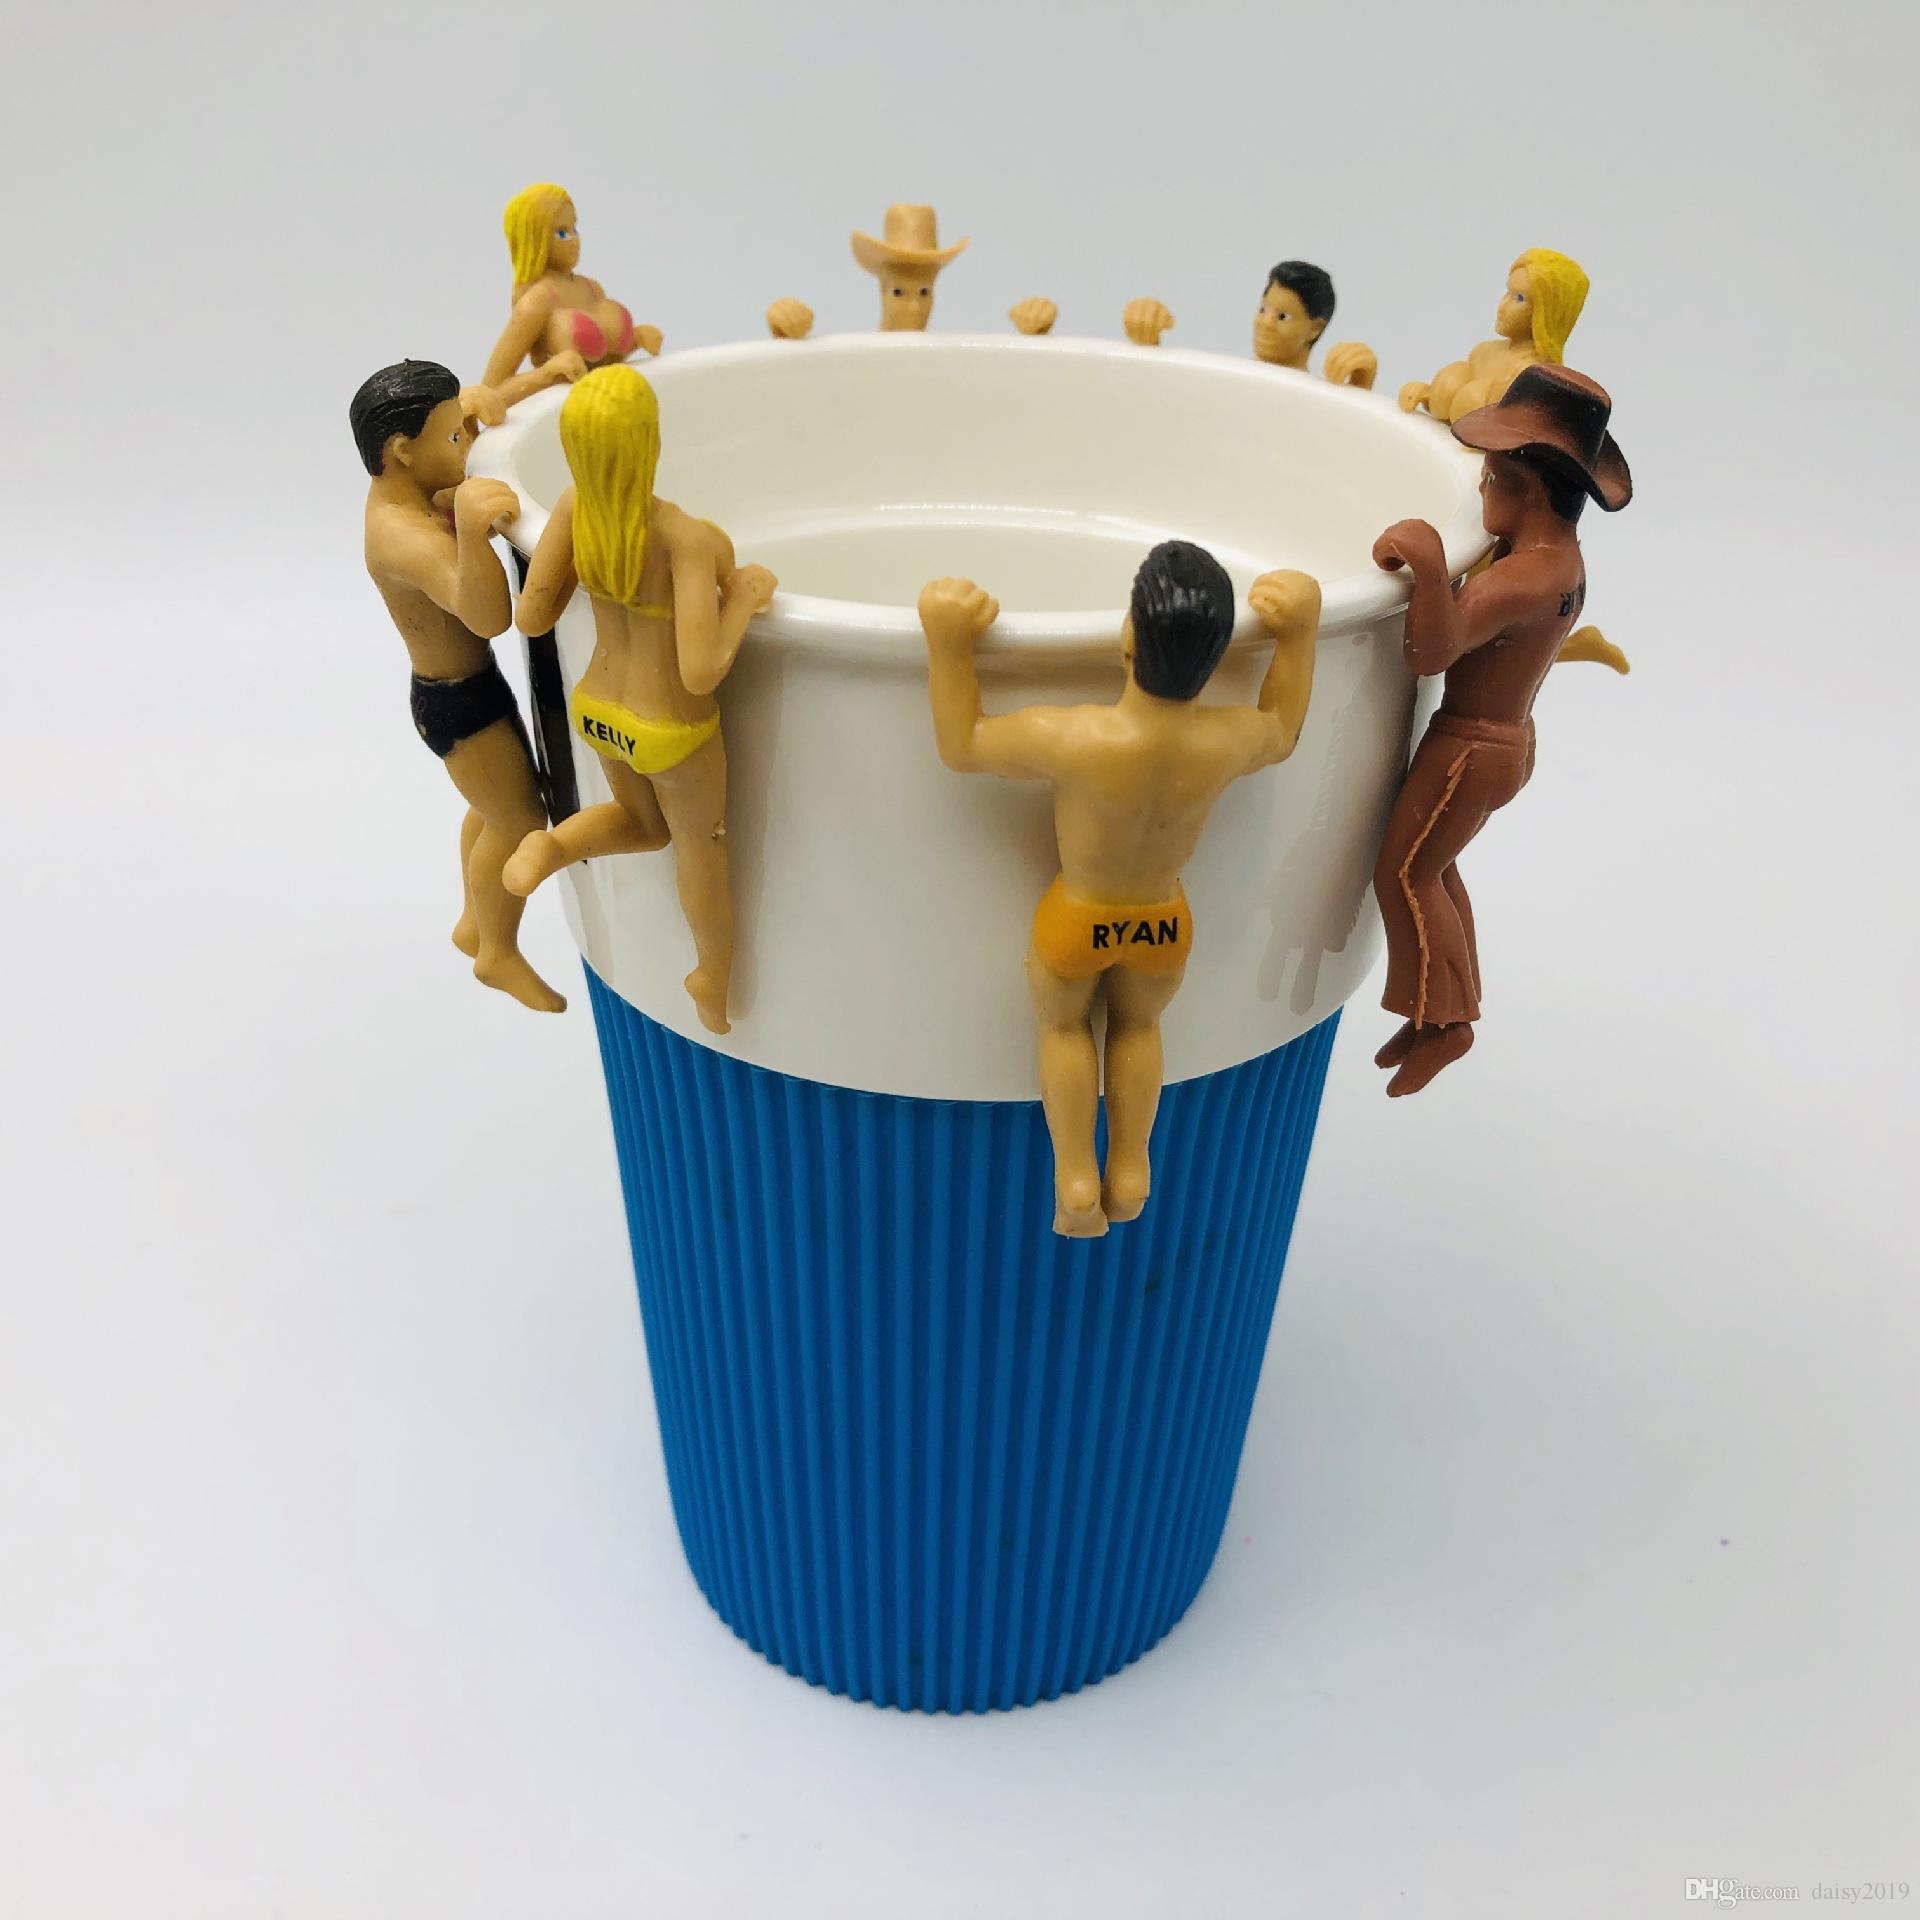 PUTITTO The Edge of Cup Series Nobi Nobita Mini PVC Figuras Juguetes Taza Decoración Muñecas